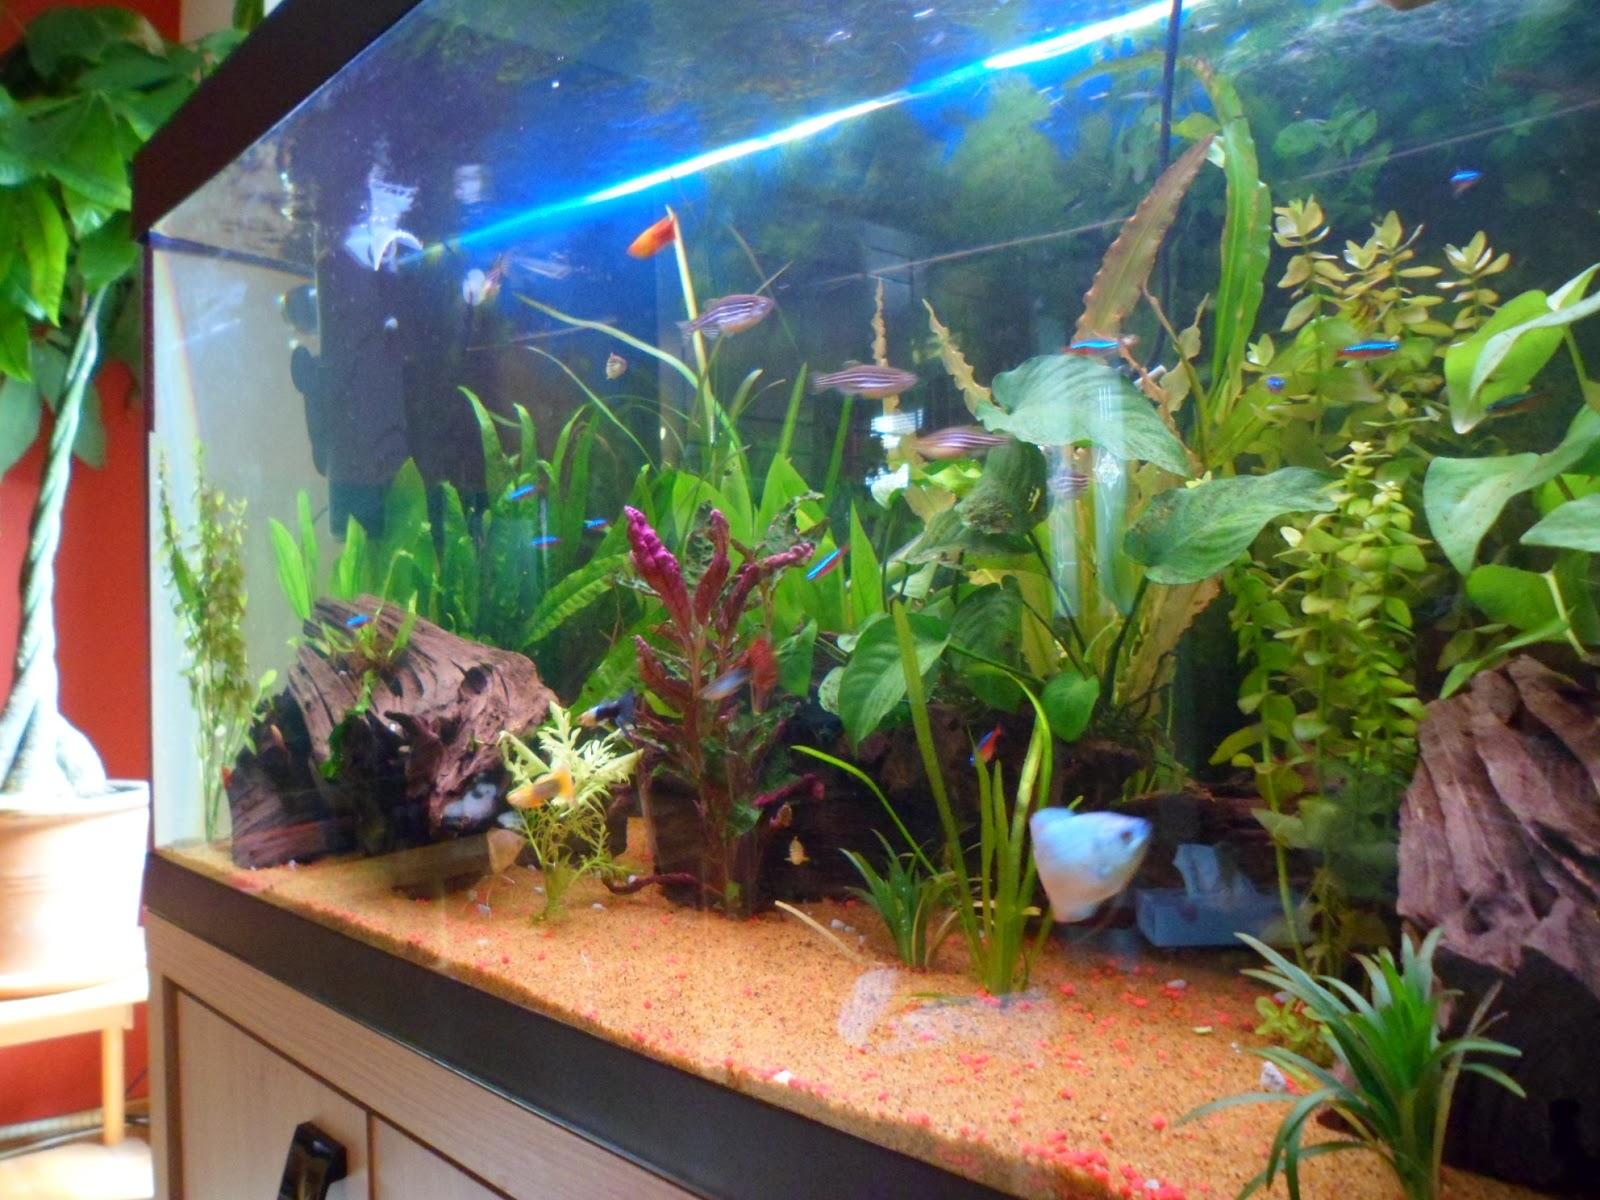 My Fish Tanks: Tuesday - Friday (Days 1 - 4)